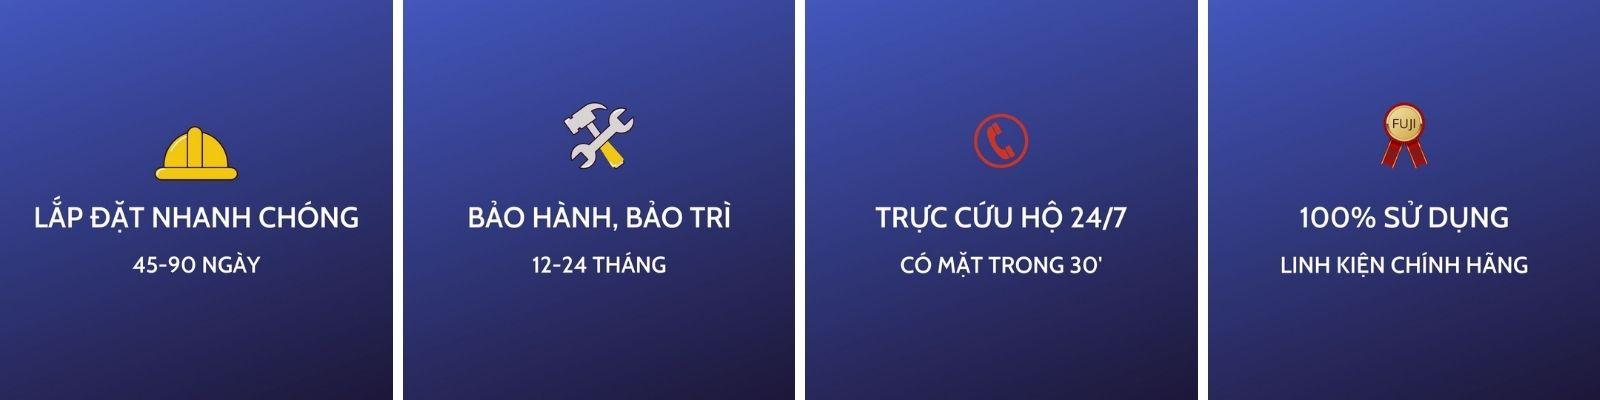 uu-diem-dich-vu-thang-may-dong-do